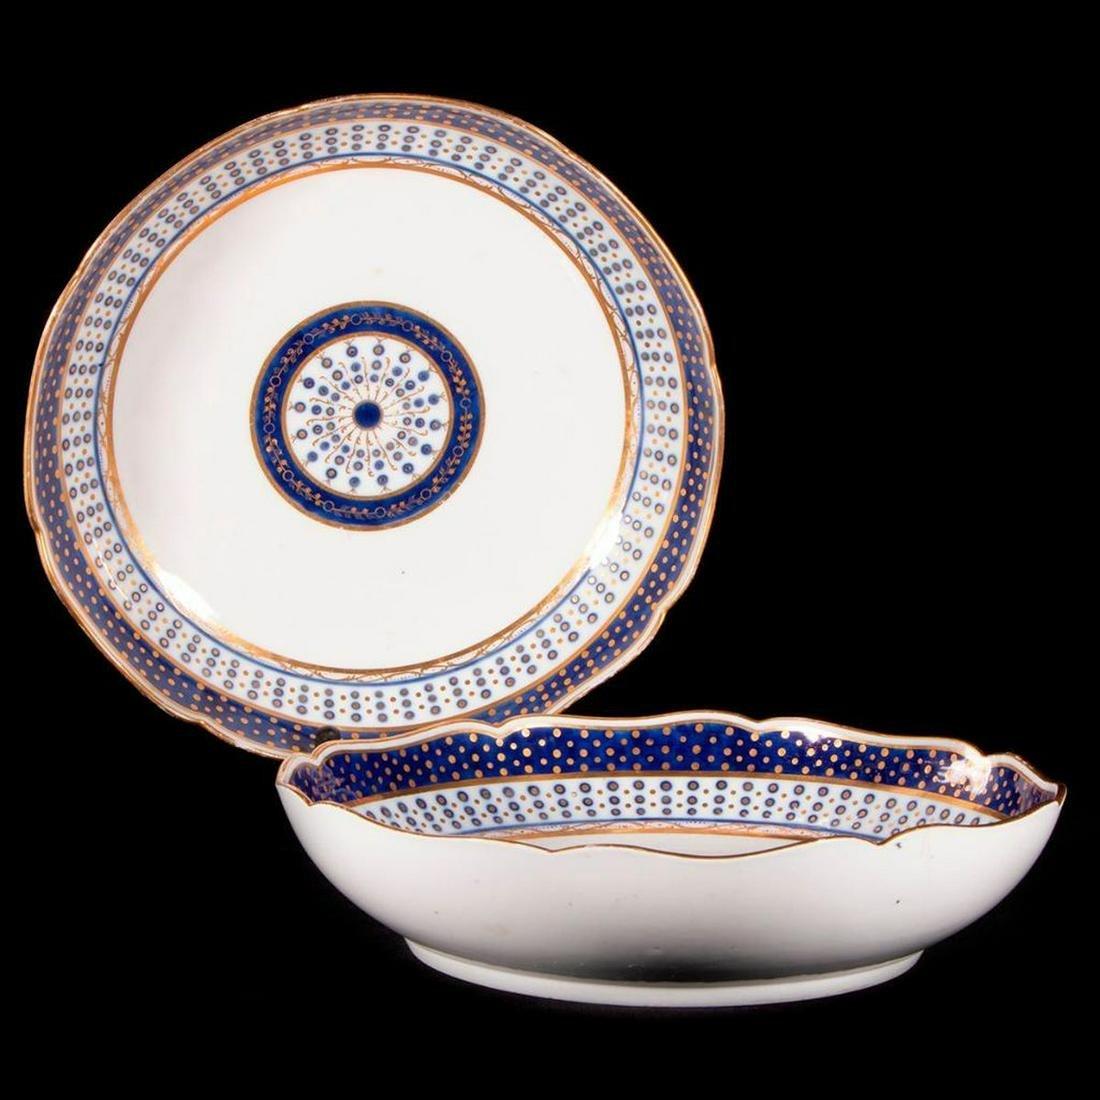 Pair of Sevres porcelain serving bowls.